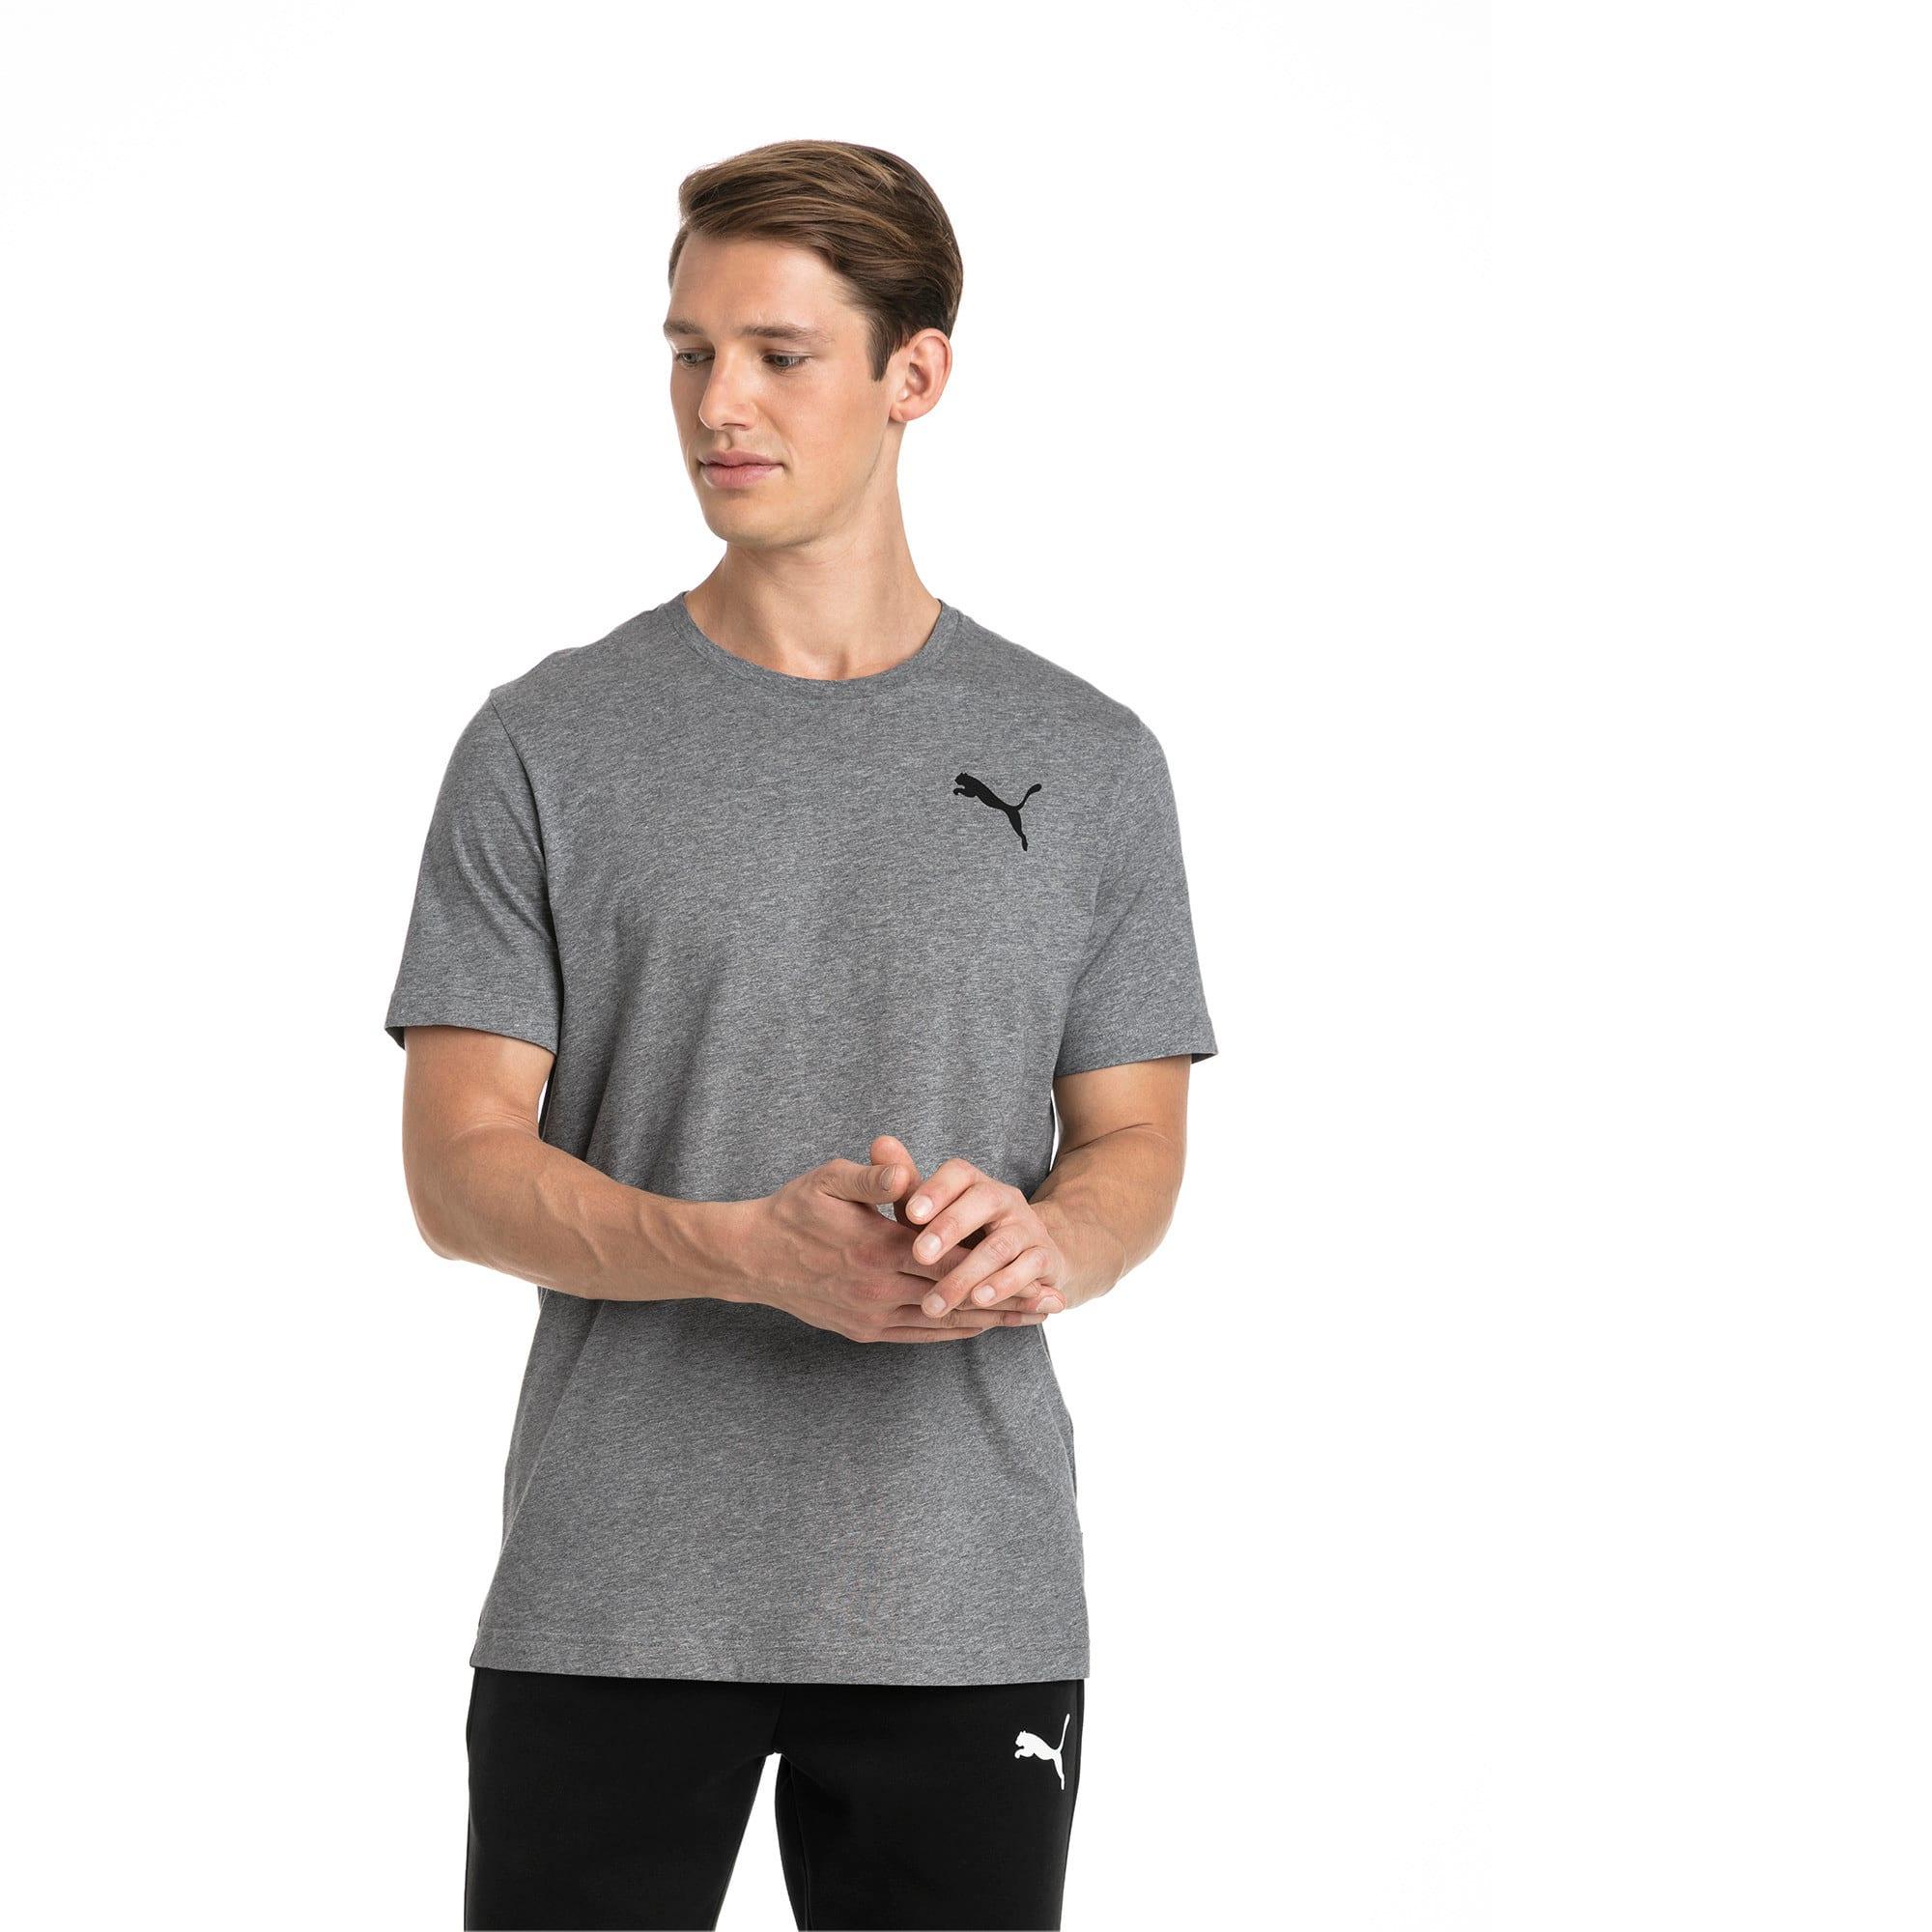 Thumbnail 1 of T-shirt con logo piccolo Essentials uomo, Medium Gray Heather-_Cat, medium